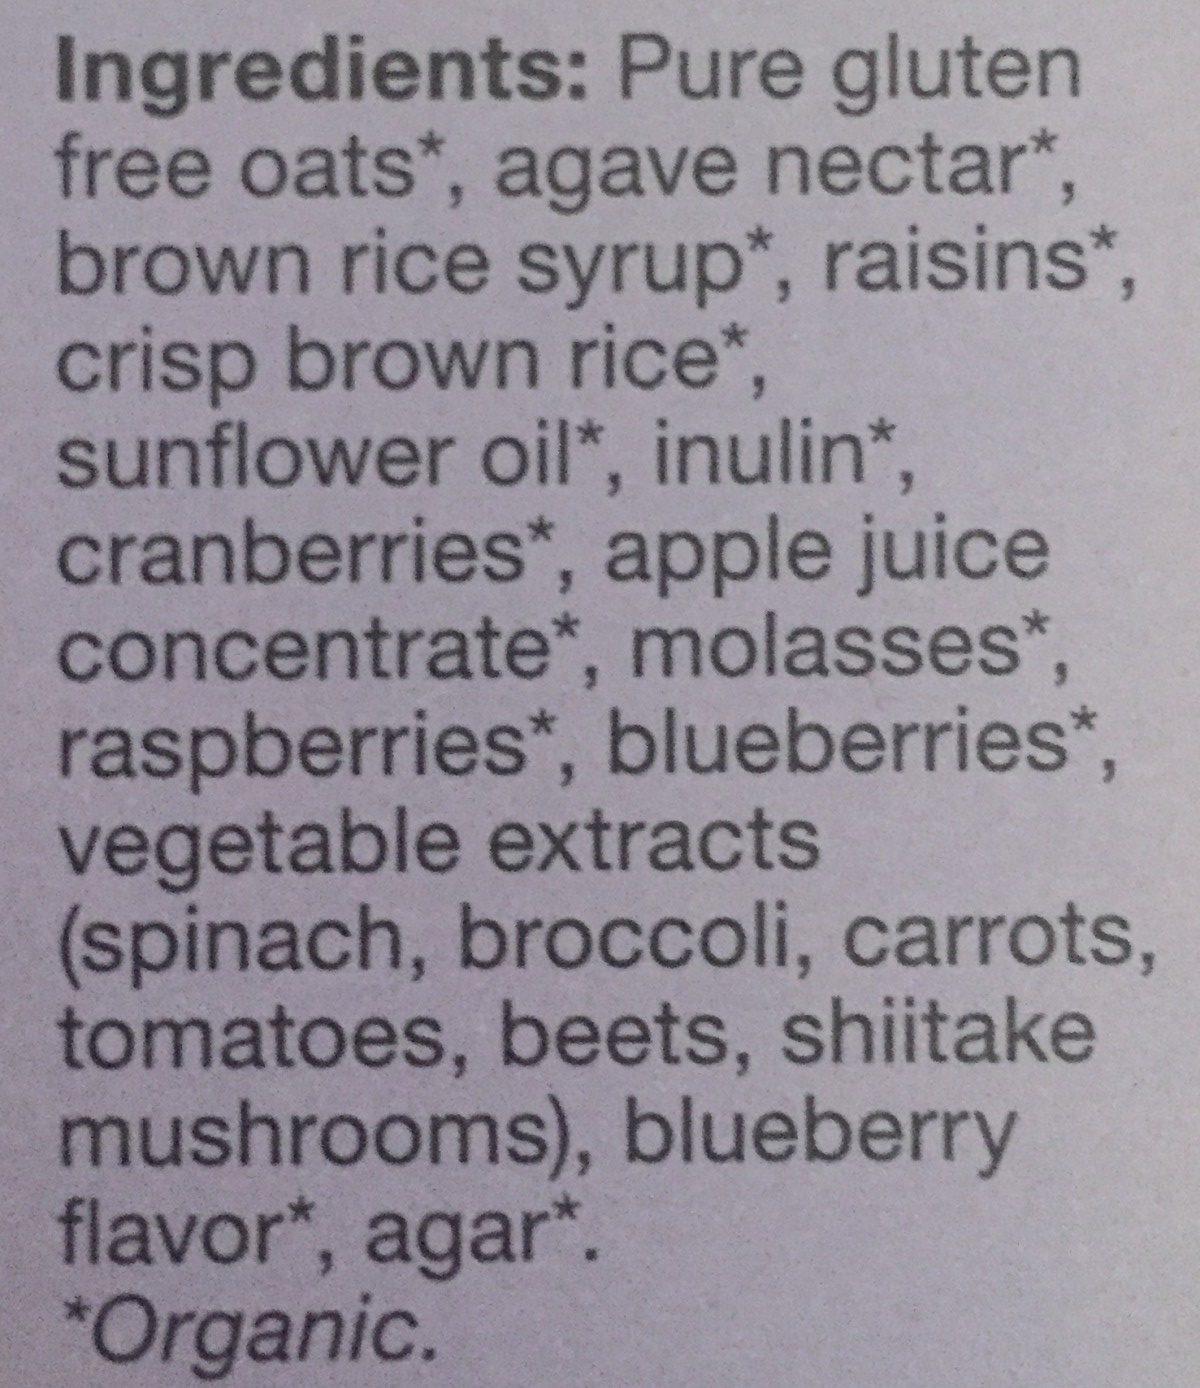 Strawberry crispy light granola, strawberry - Ingredients - en